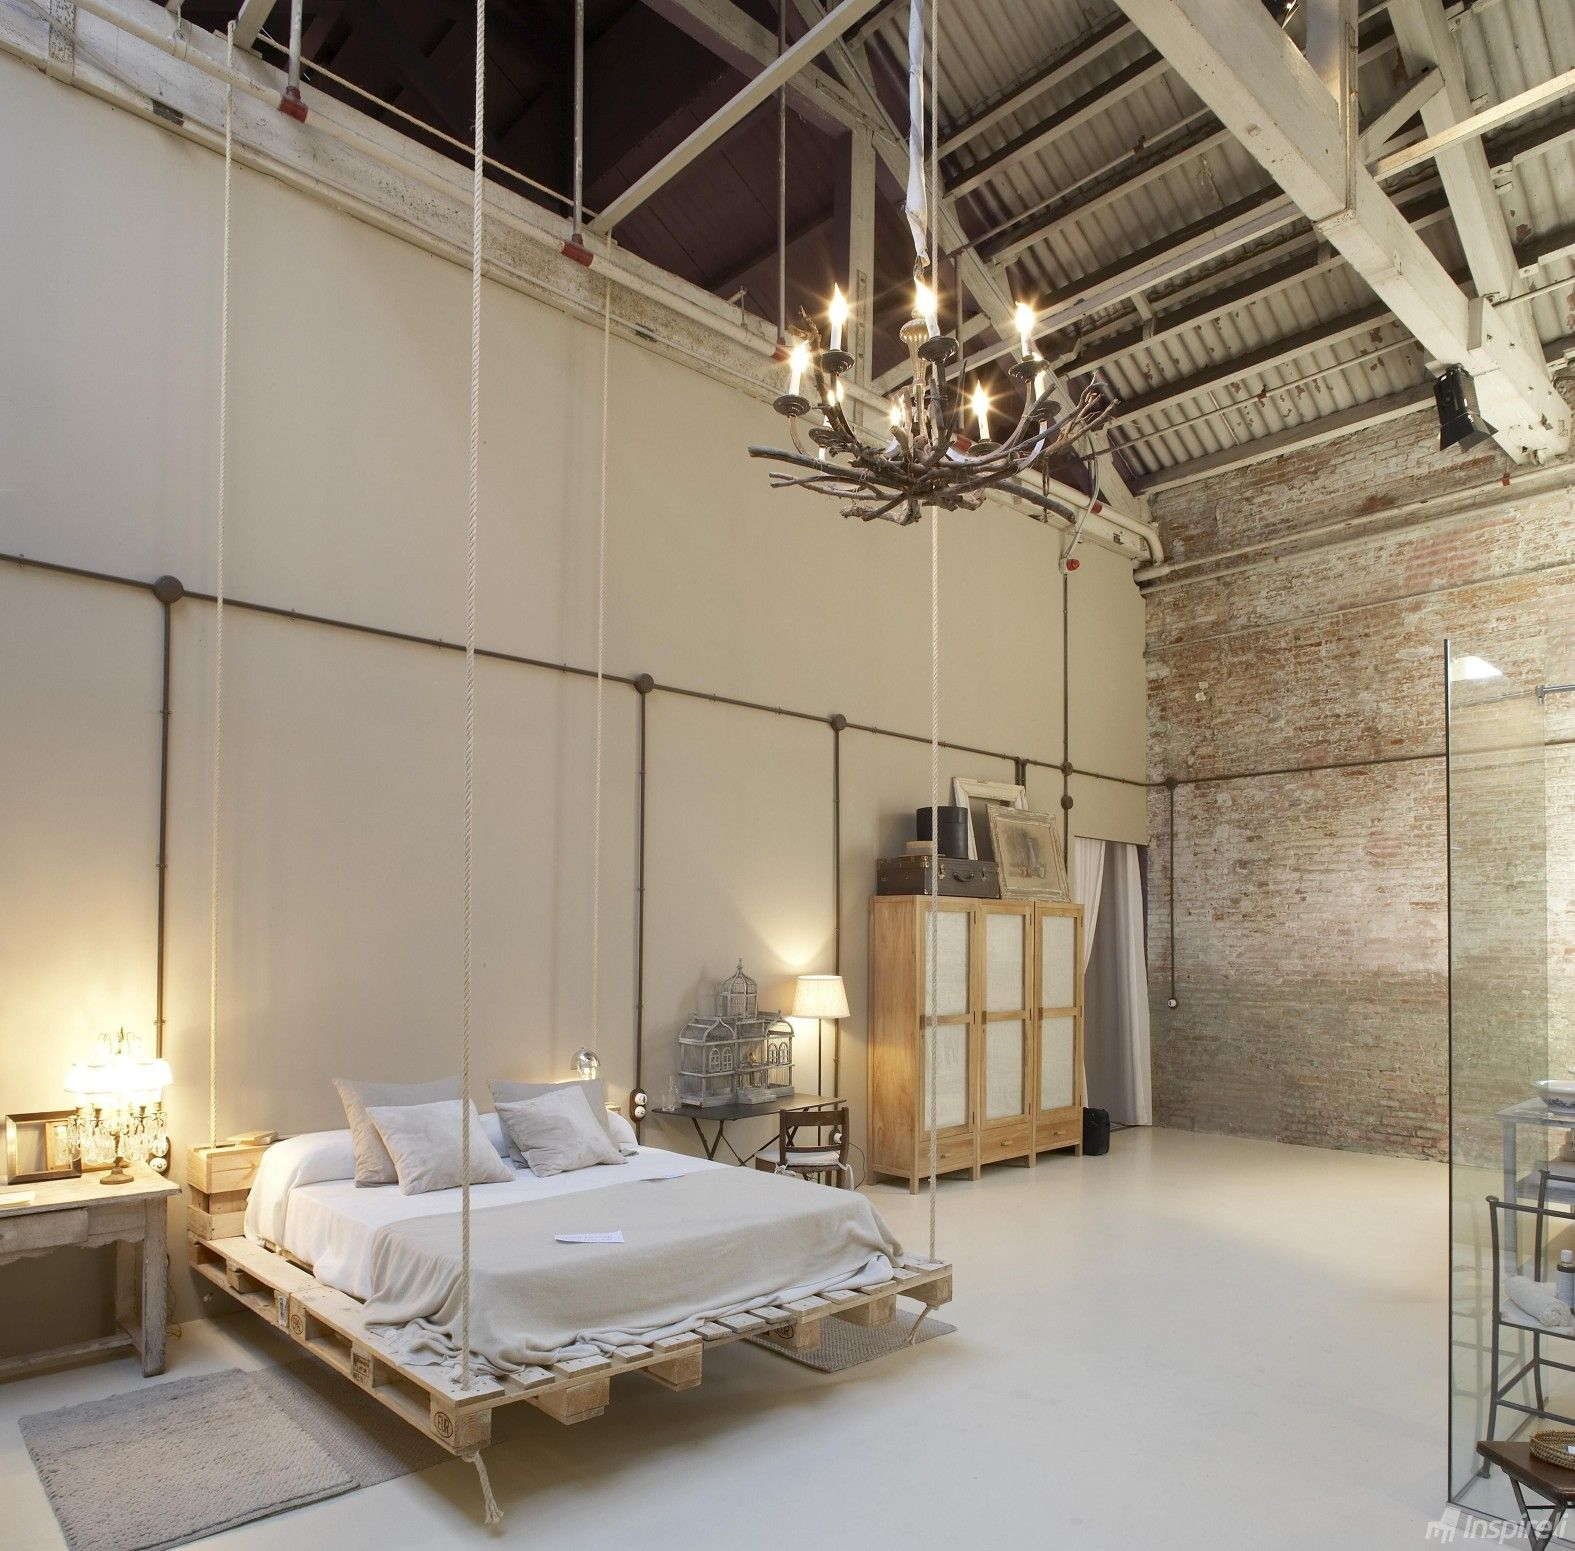 Bedroom Furniture Design Trends 2016. Unusual radical loft design for the former commercial premises with swing bad